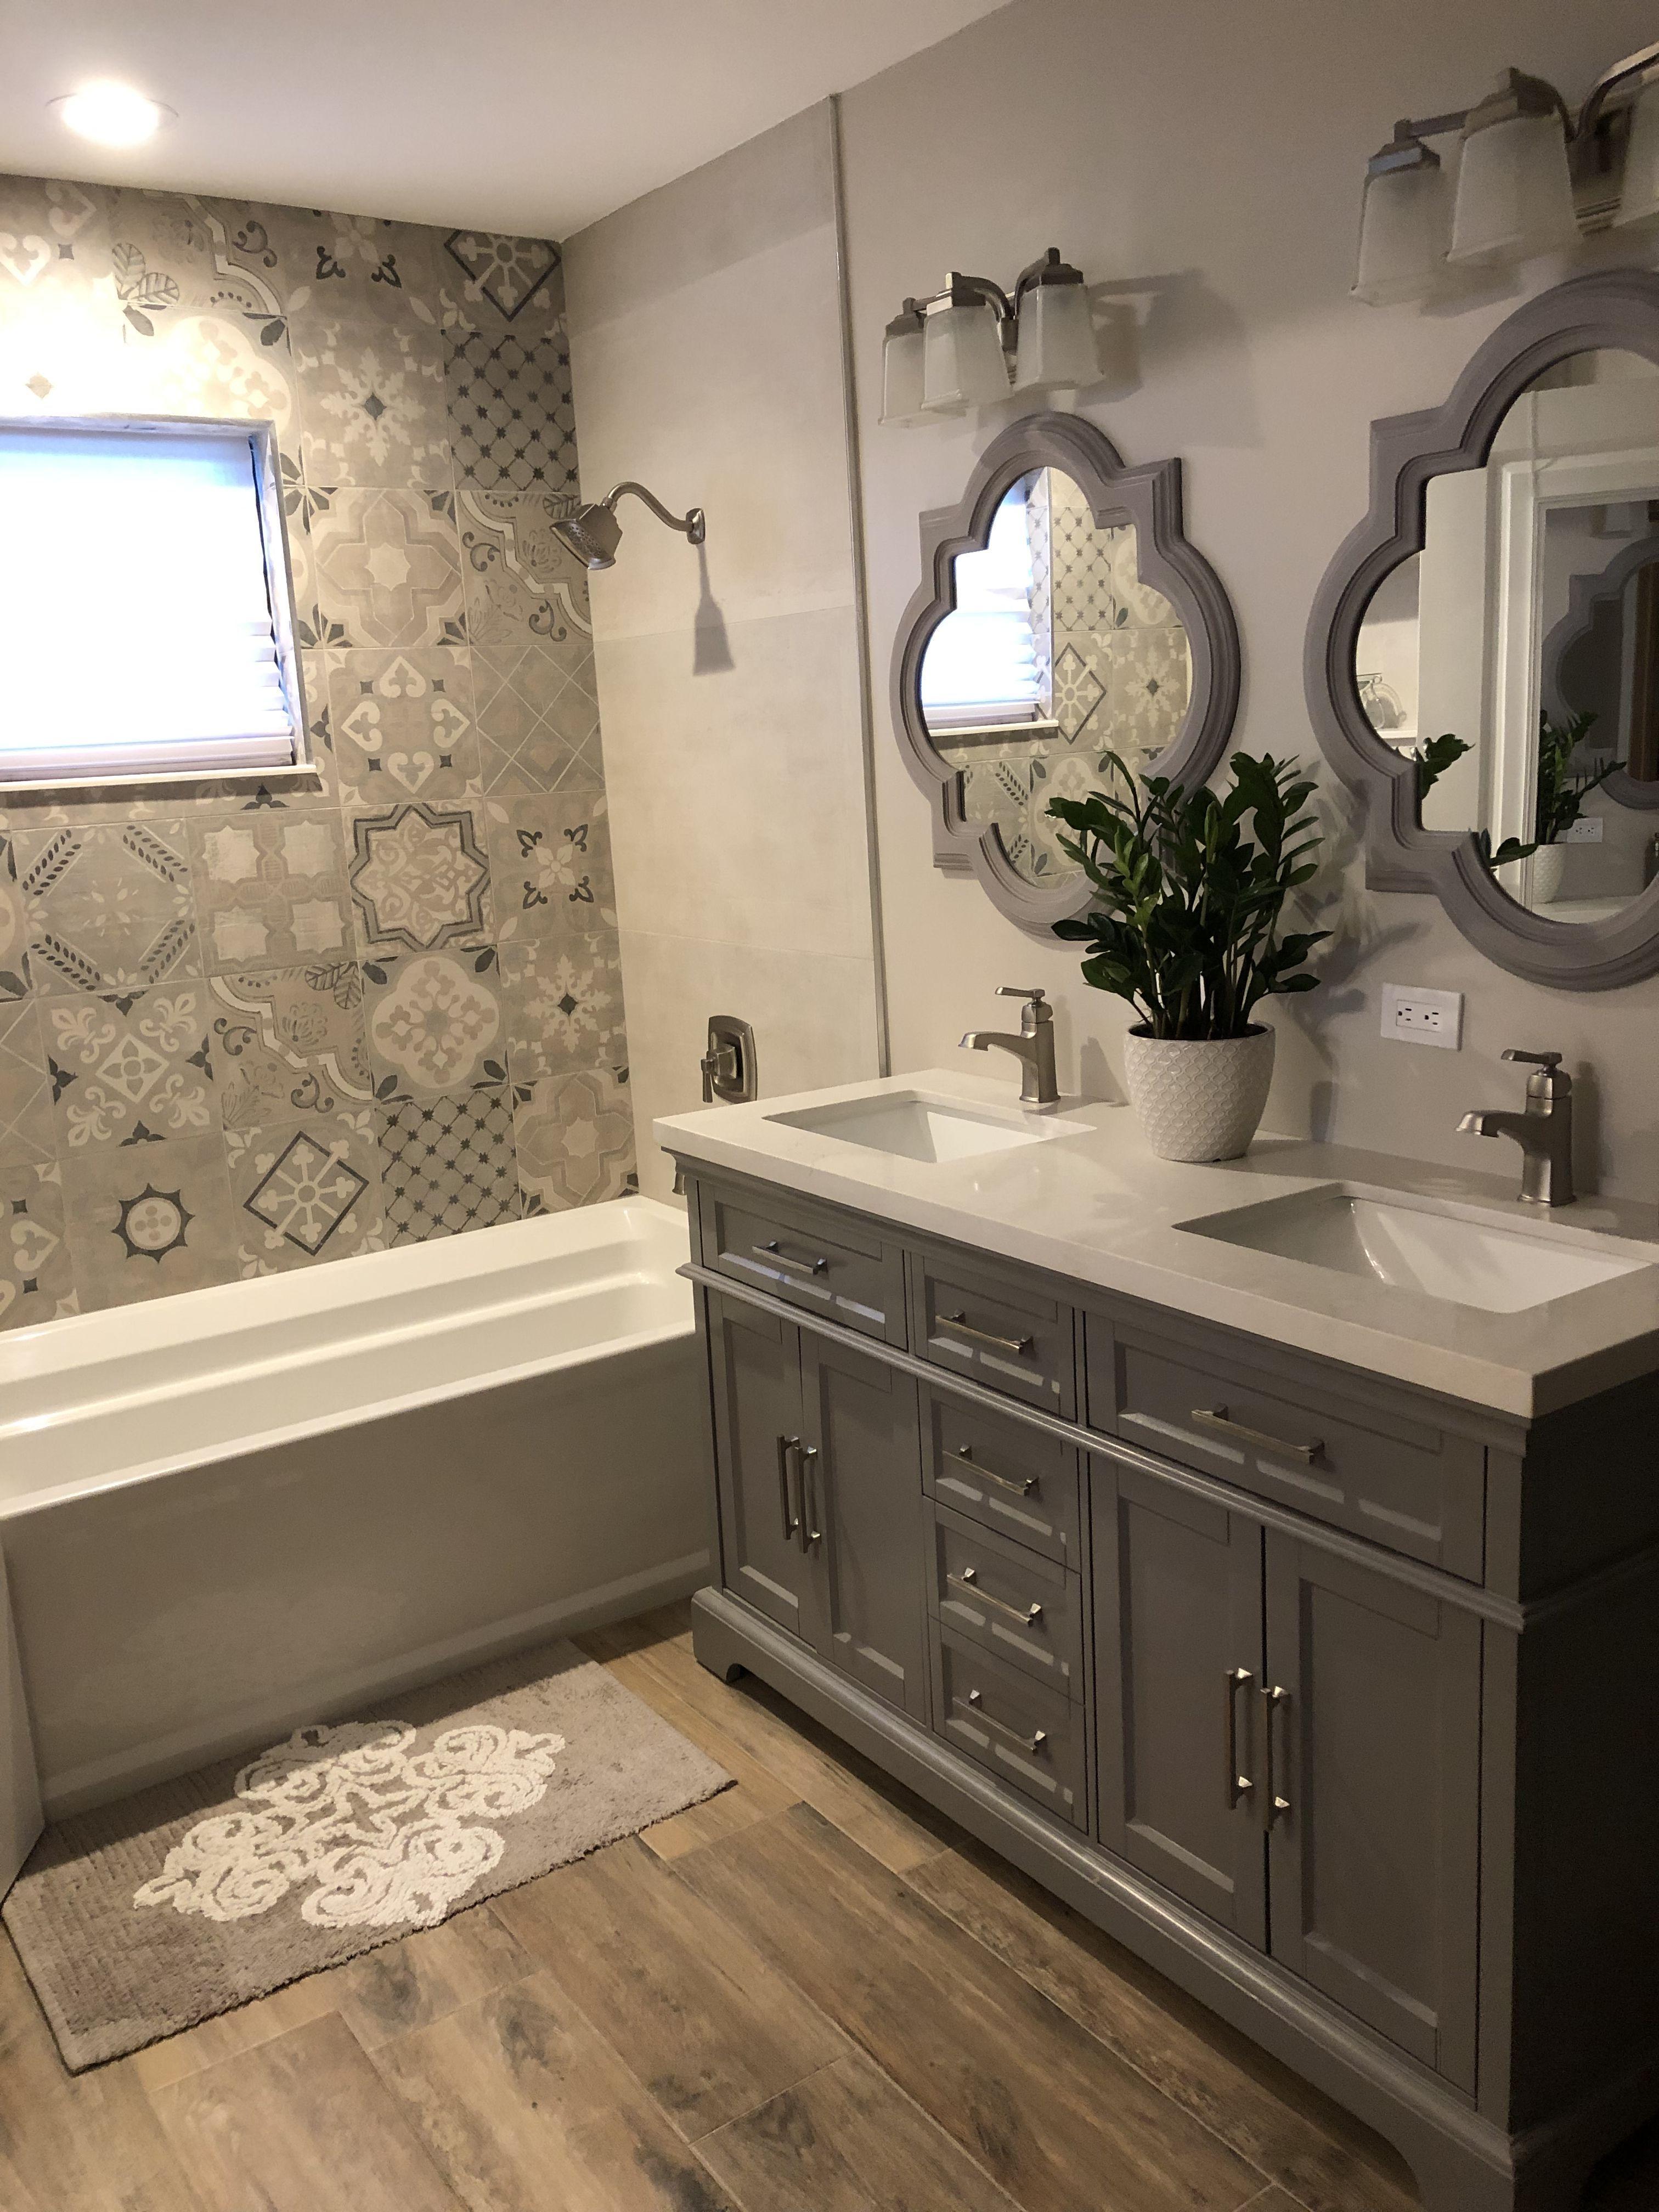 gray and beige bathroom beigebathroomdesigns bathrooms in 2019 rh in pinterest com